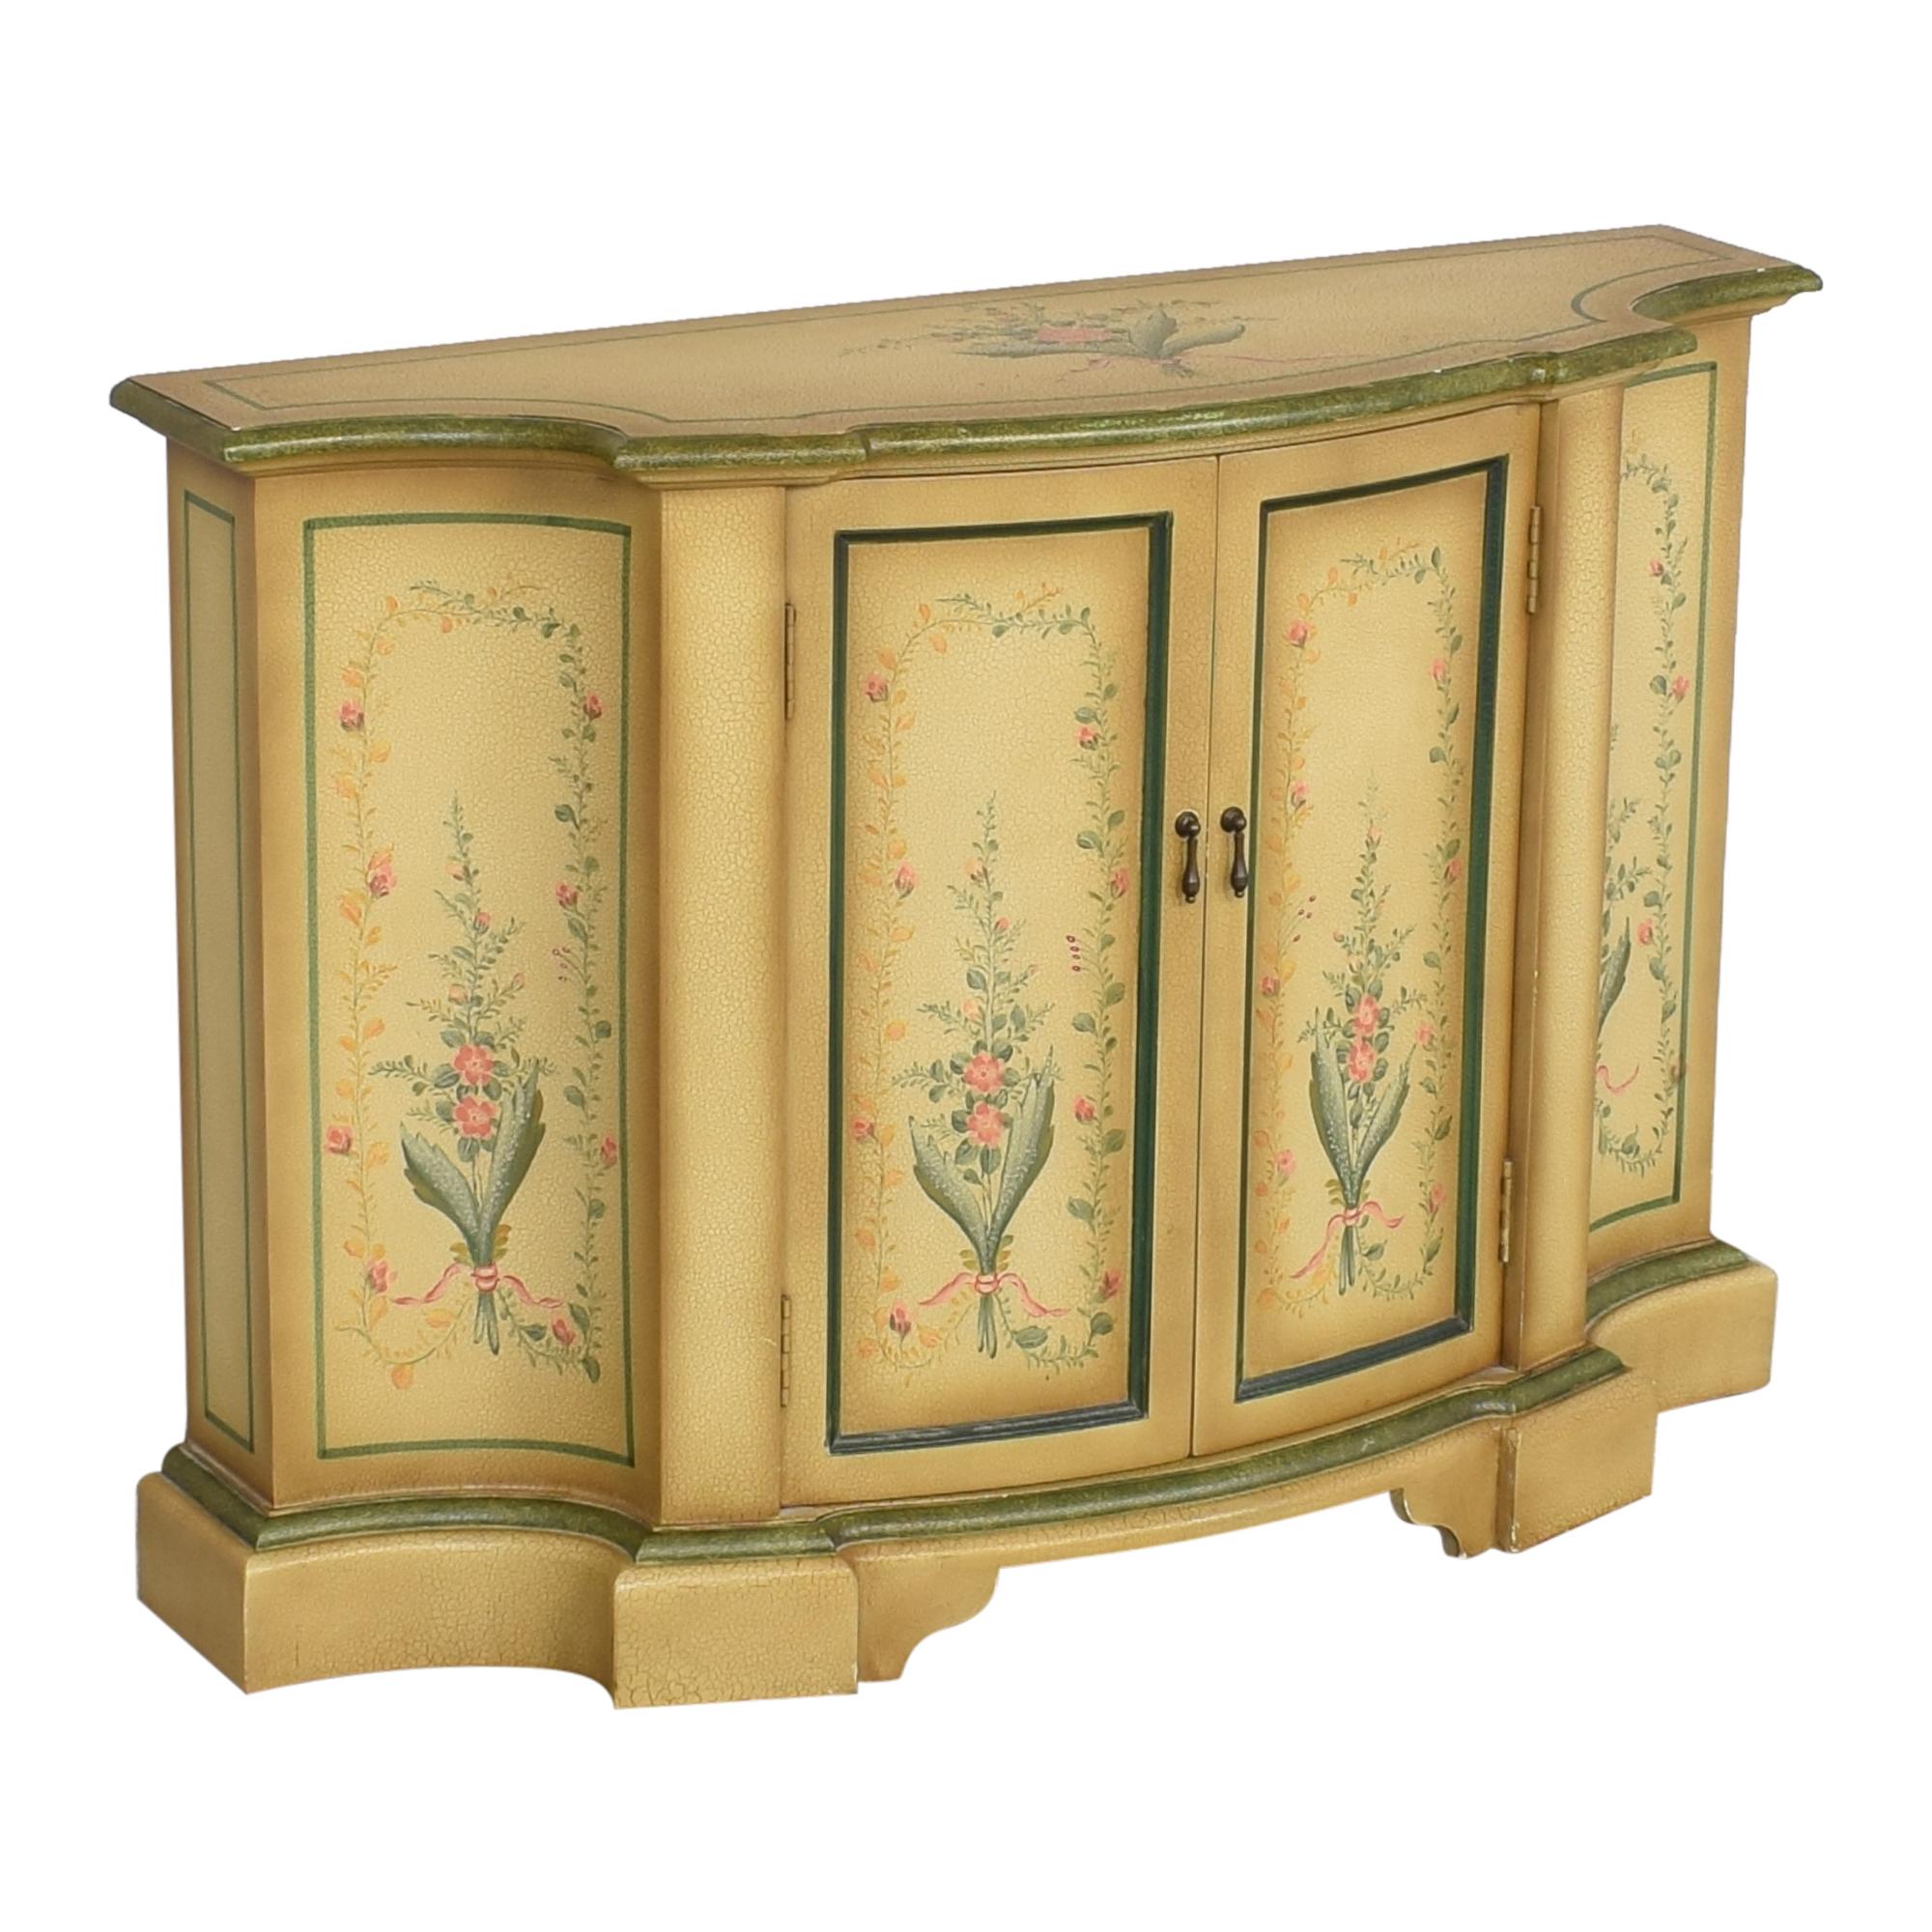 Vintage Painted Sideboard Credenza / Cabinets & Sideboards